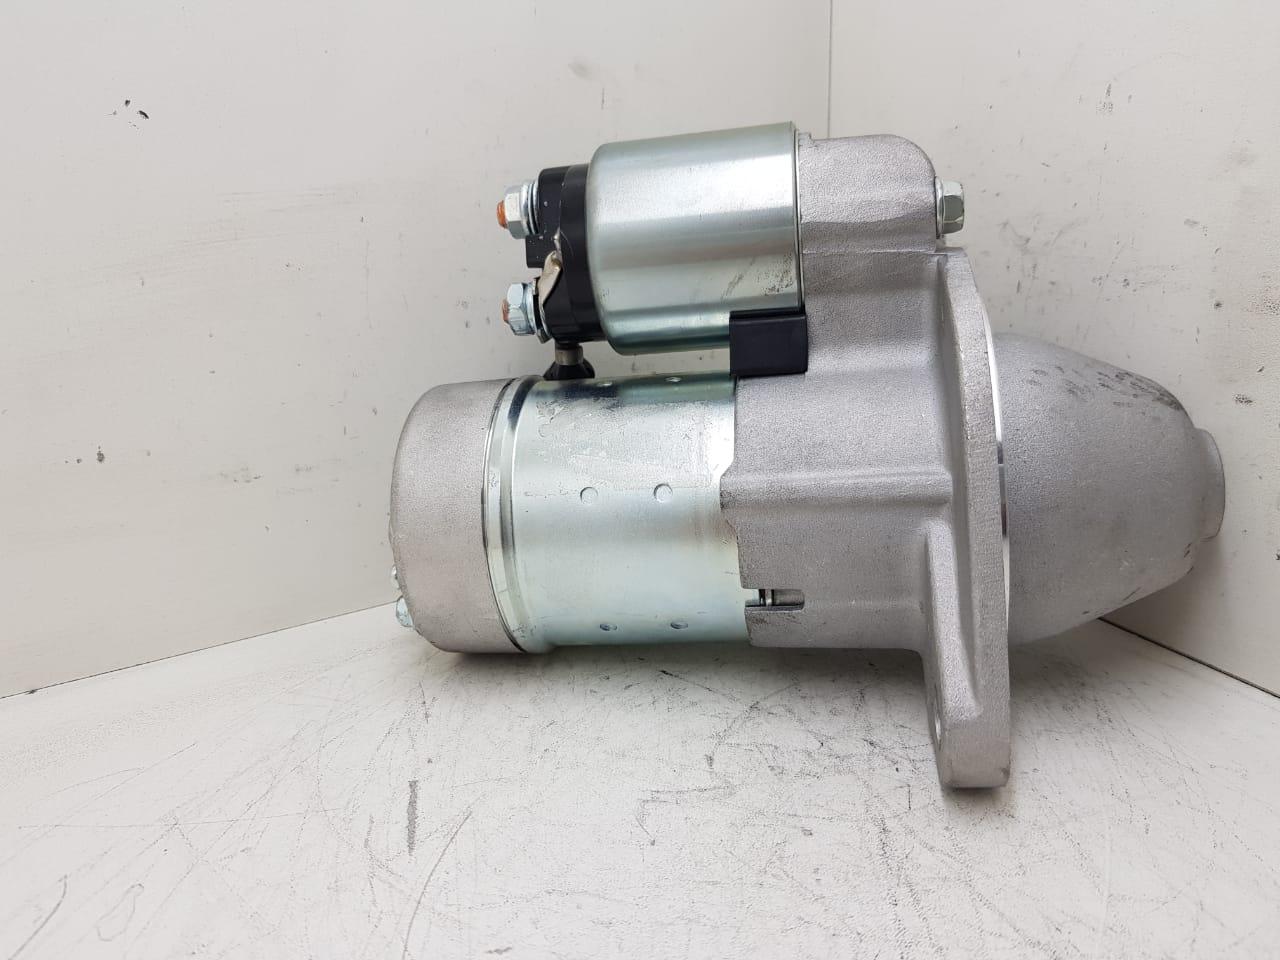 Motor de arranque CASE CX27B CX31B CX36B New Holland E27B E30B E35B YANMAR 3TNV82 3TNV88 HITACHI 12V 11 DENTES 12969877010 12924277010 S114815 S114883 AEC17022